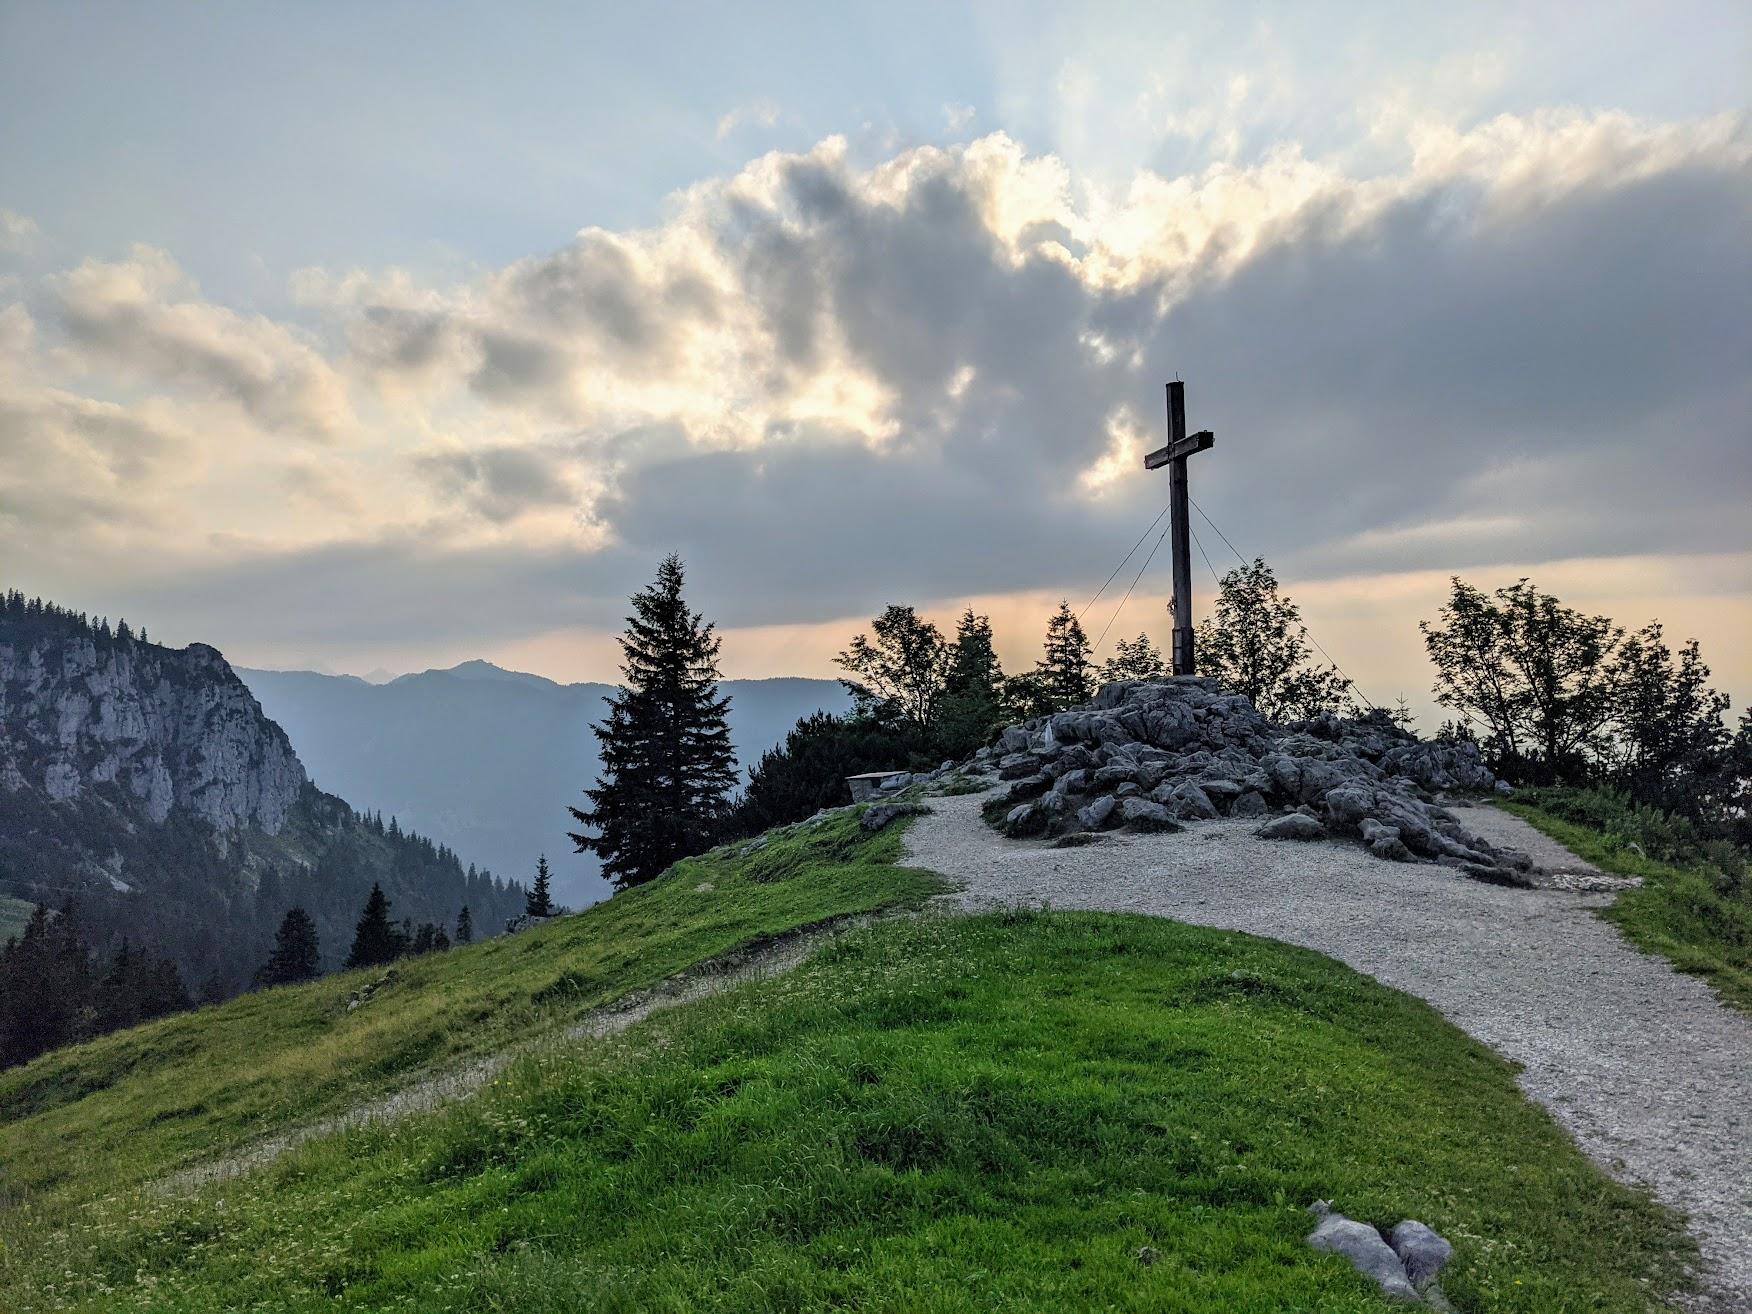 Chiemgau: Kampenwand trails mtb - July 21